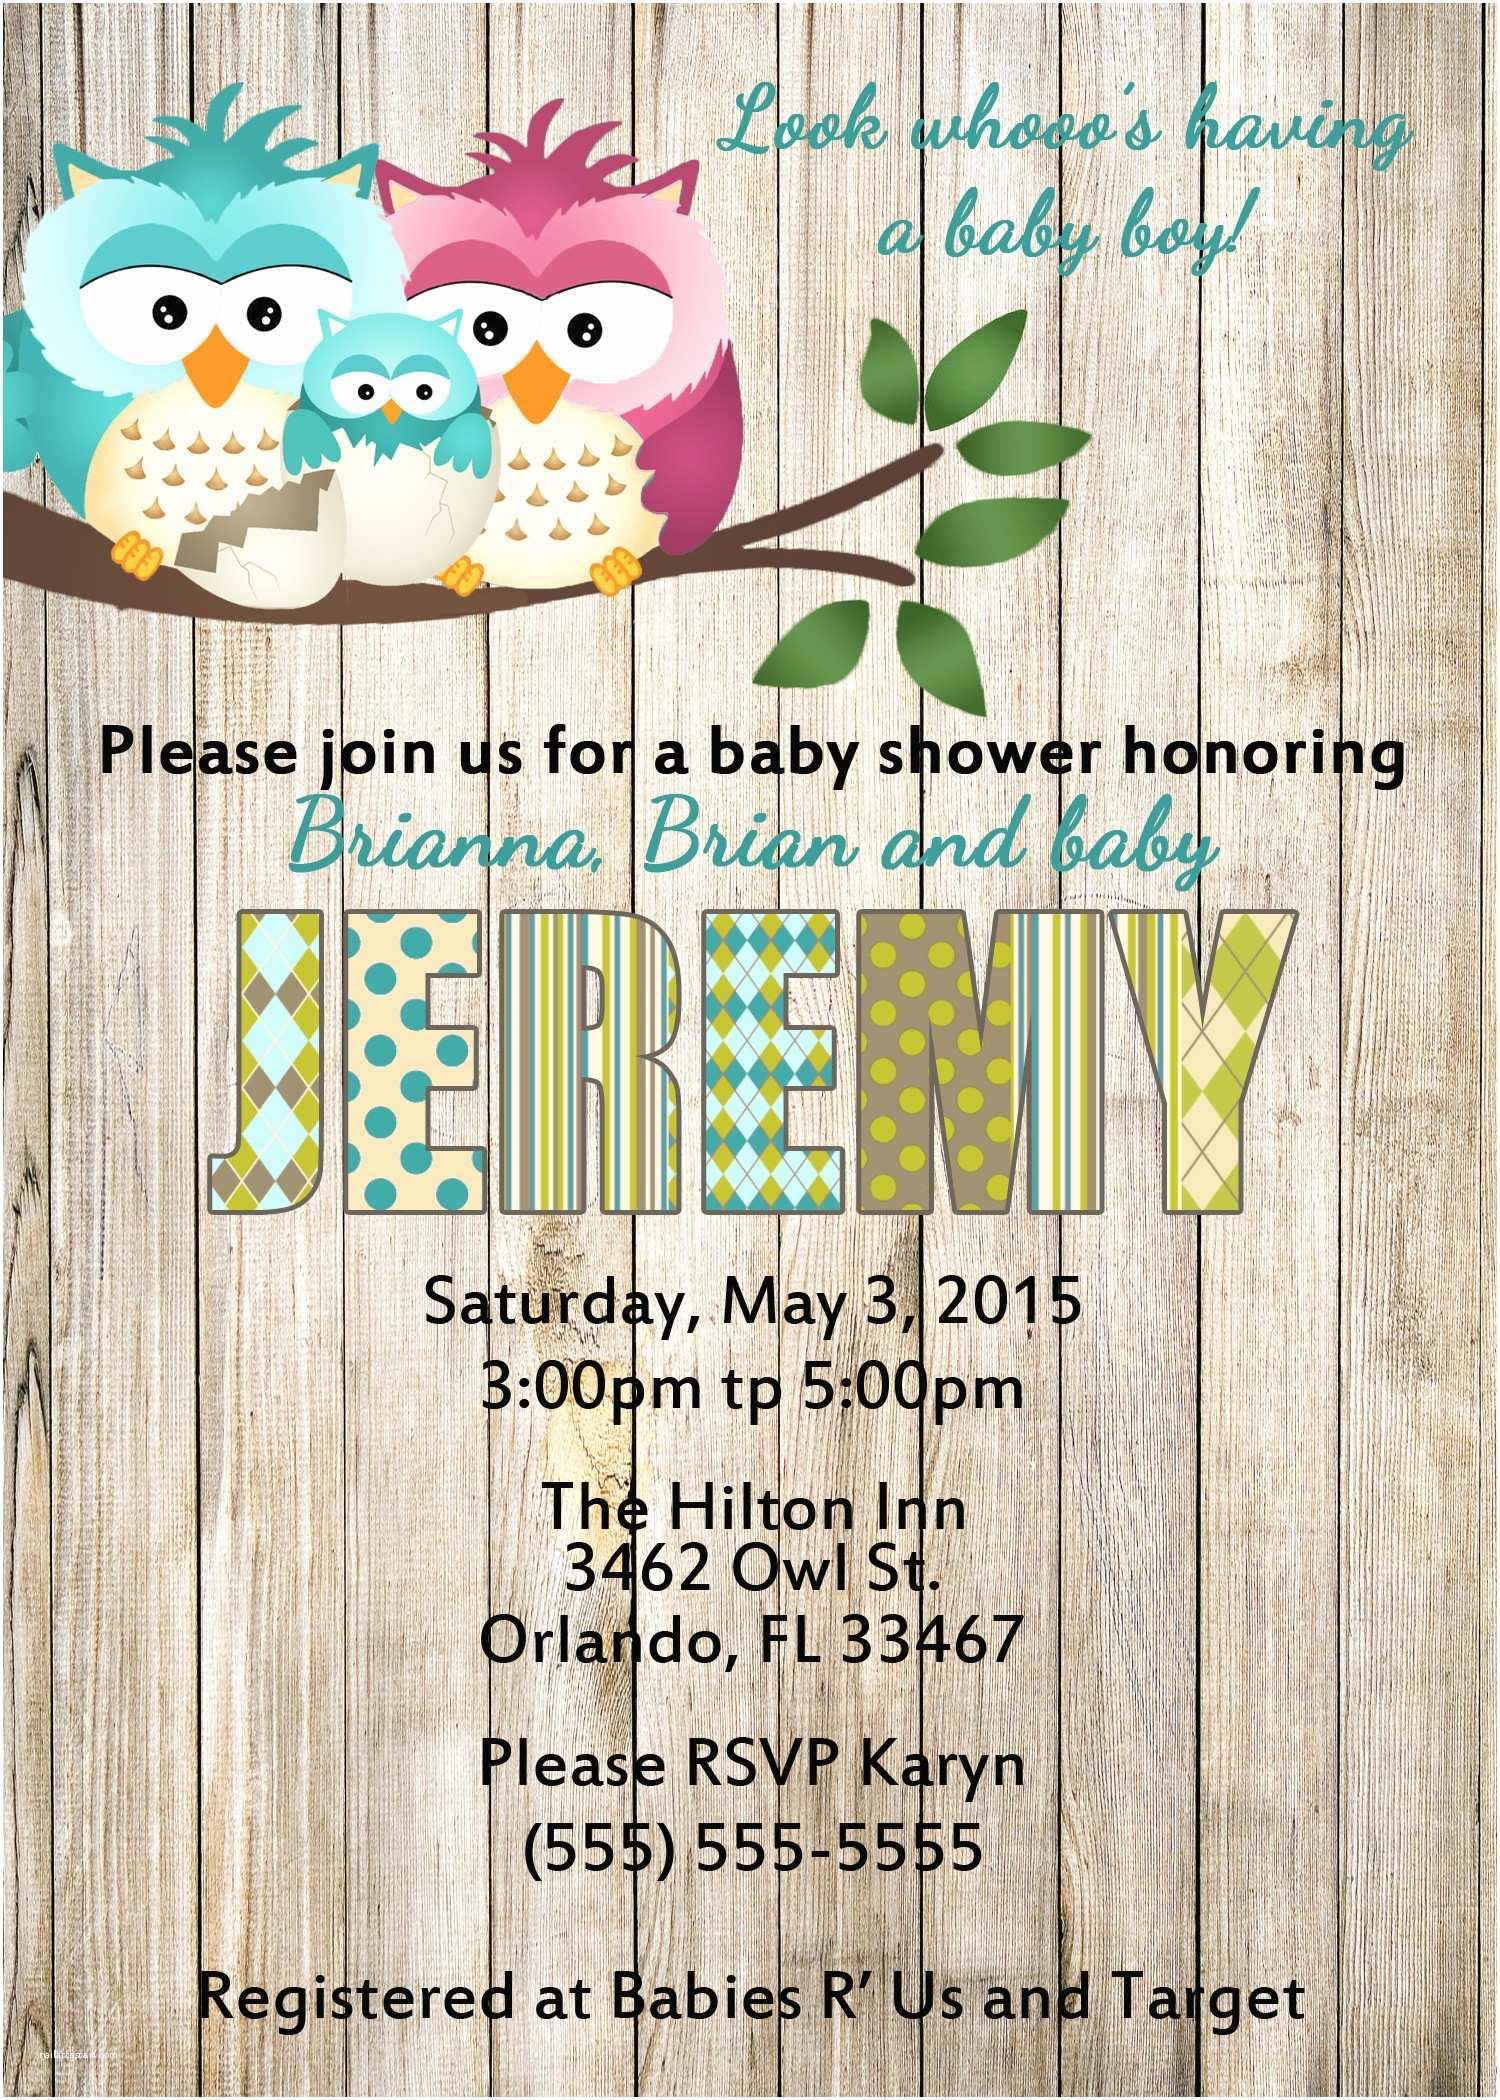 Baby Shower Invitations for Boy Owl Baby Shower Invitations